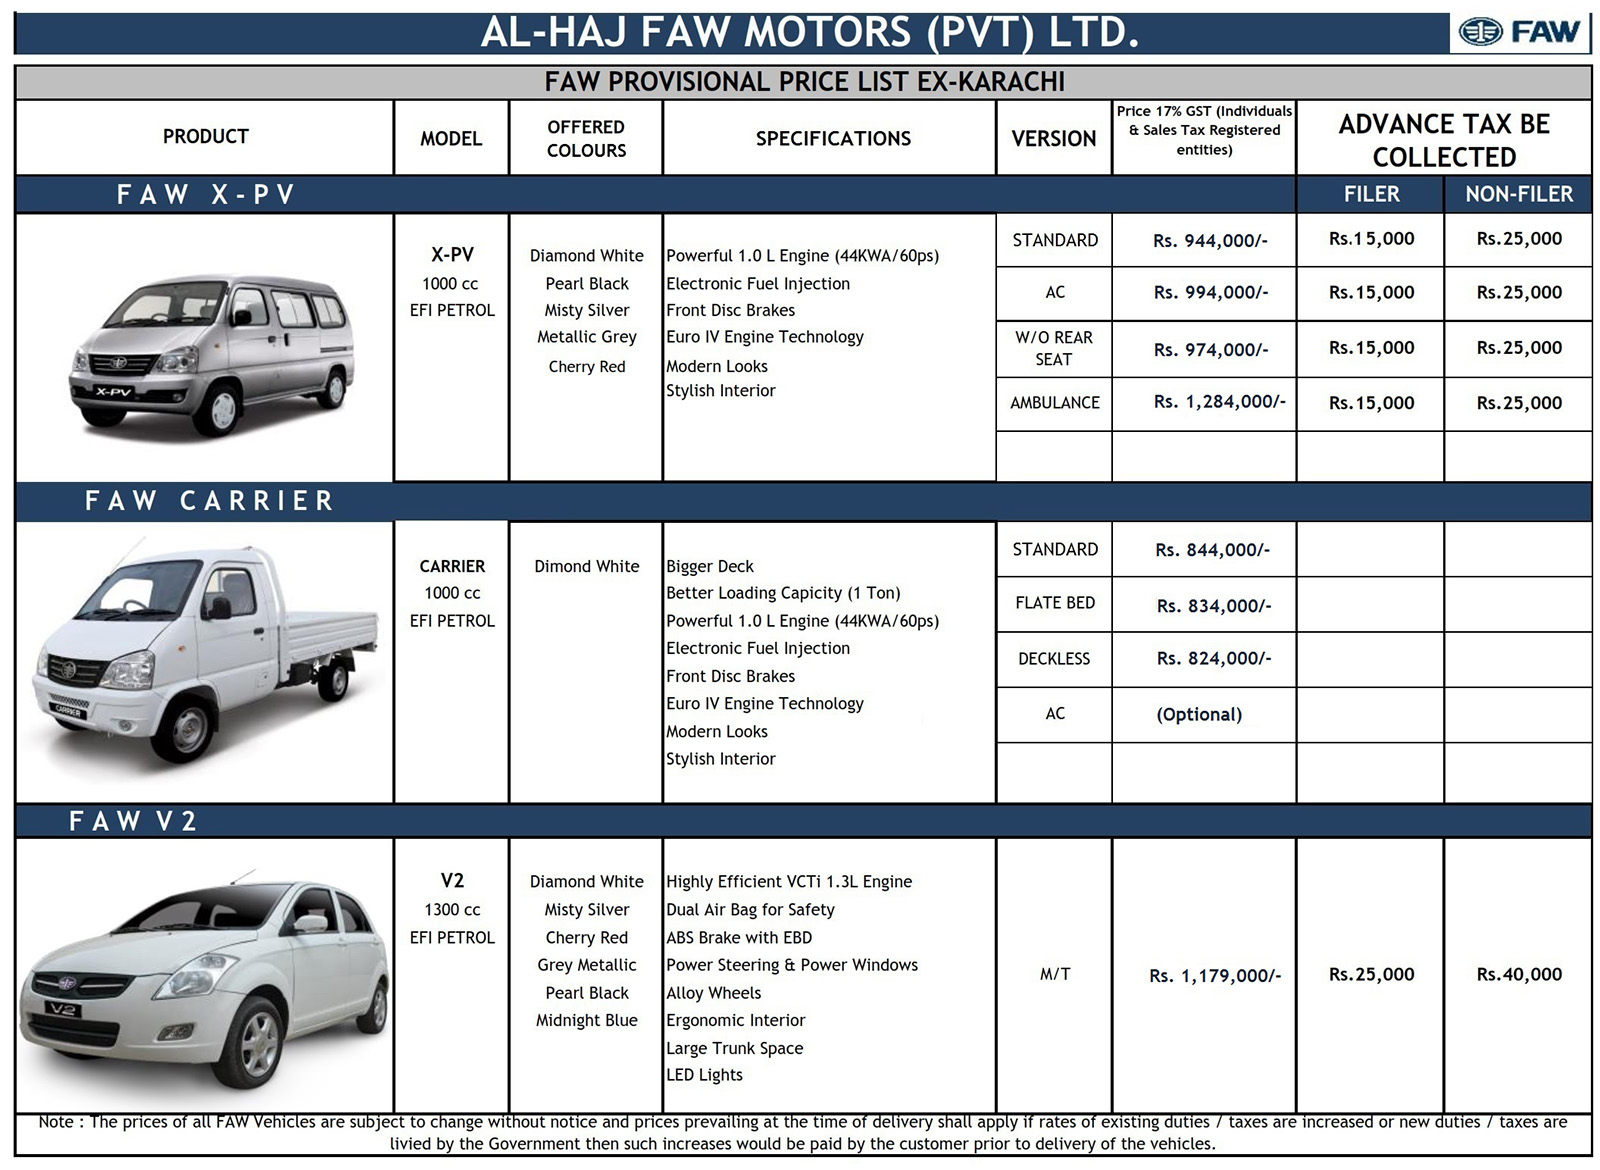 Al-Haj FAW Revises Car Prices Again 1